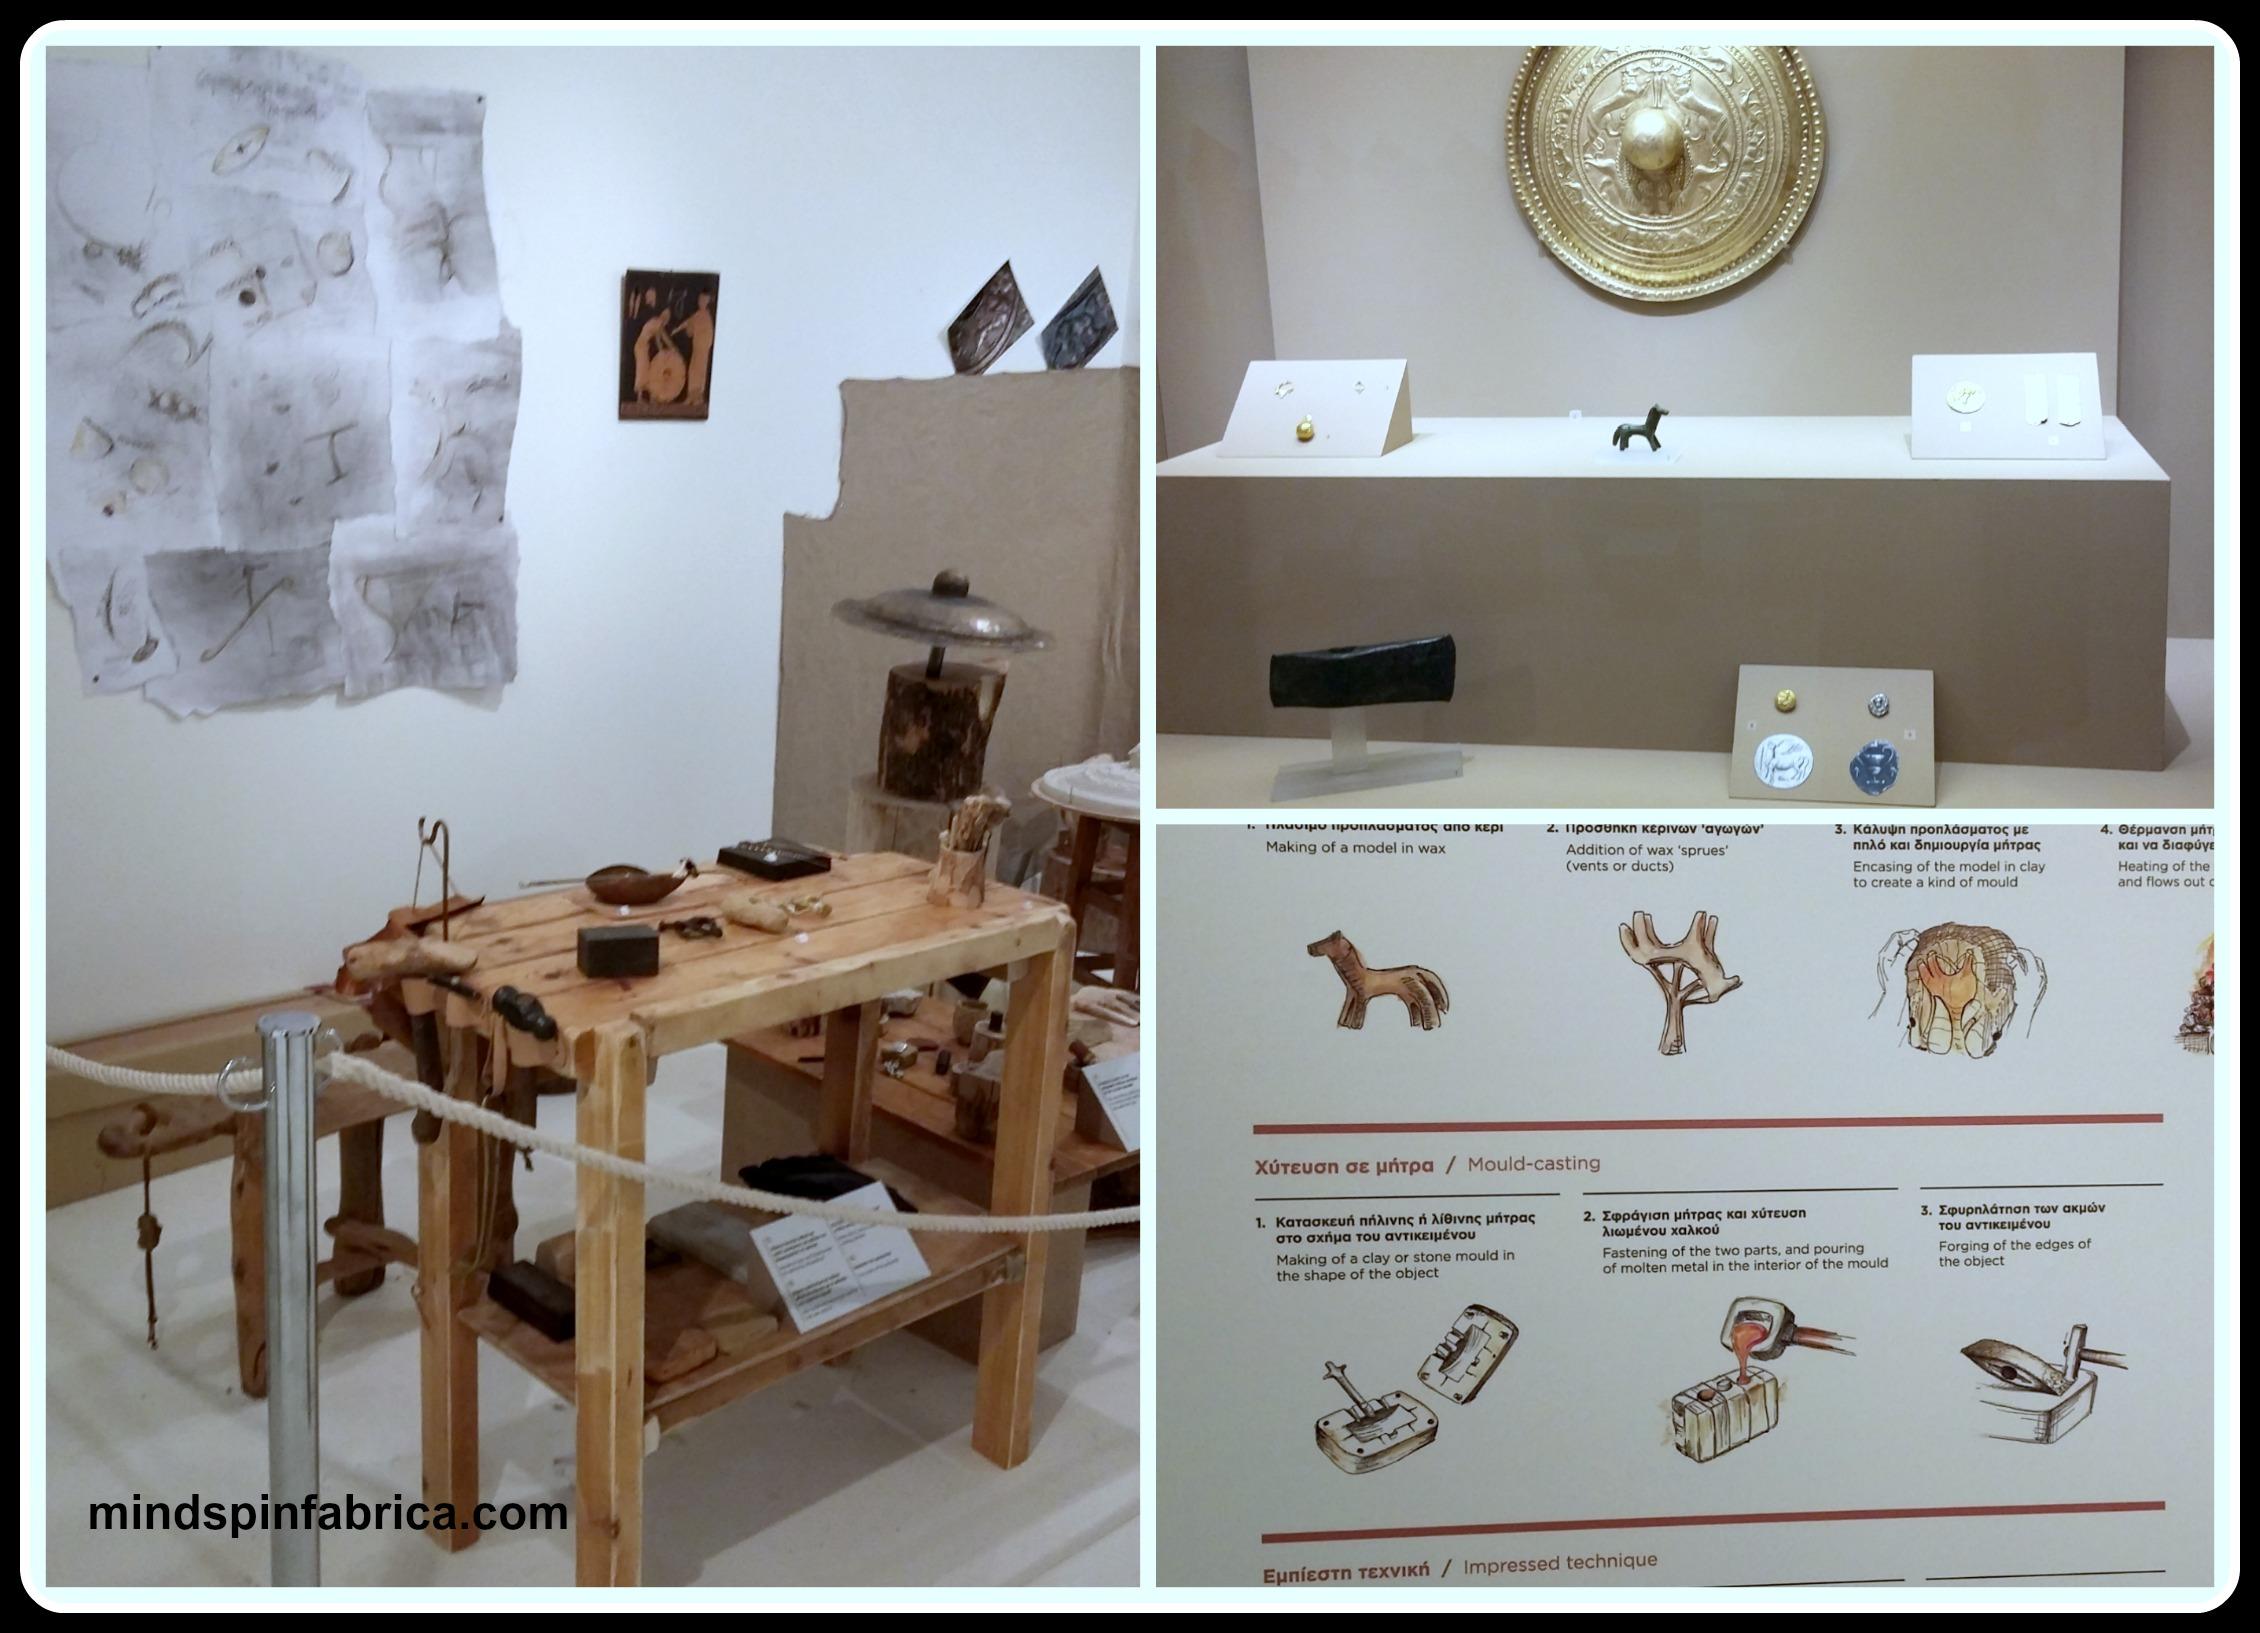 mindspinfabrica.com_Cycladic Art Museum,Athens